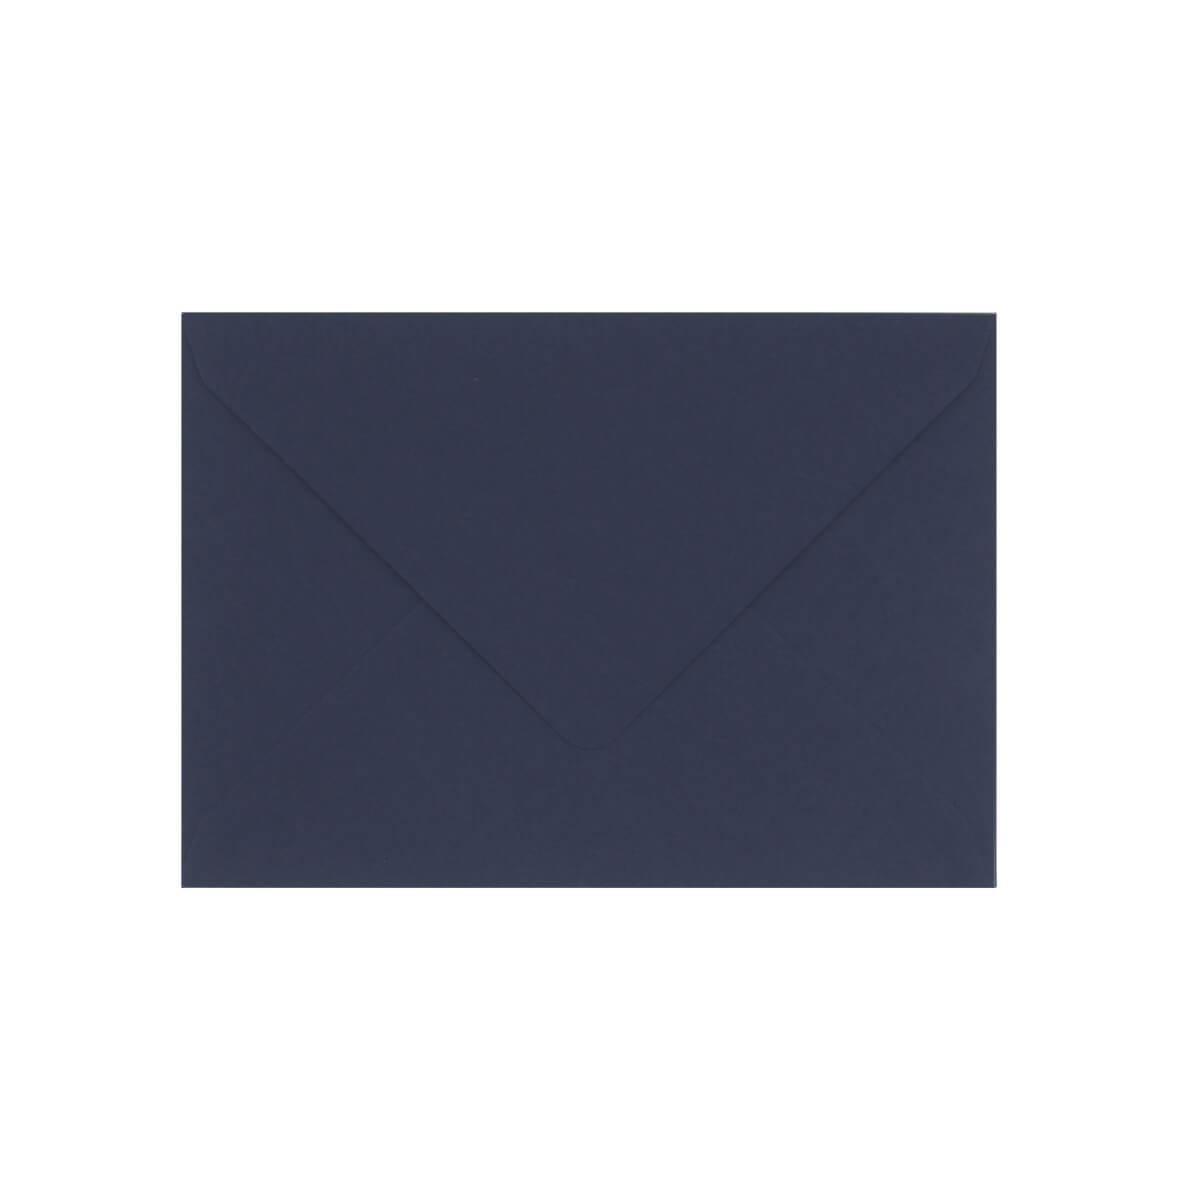 DARK BLUE 152 x 216mm ENVELOPES 120GSM